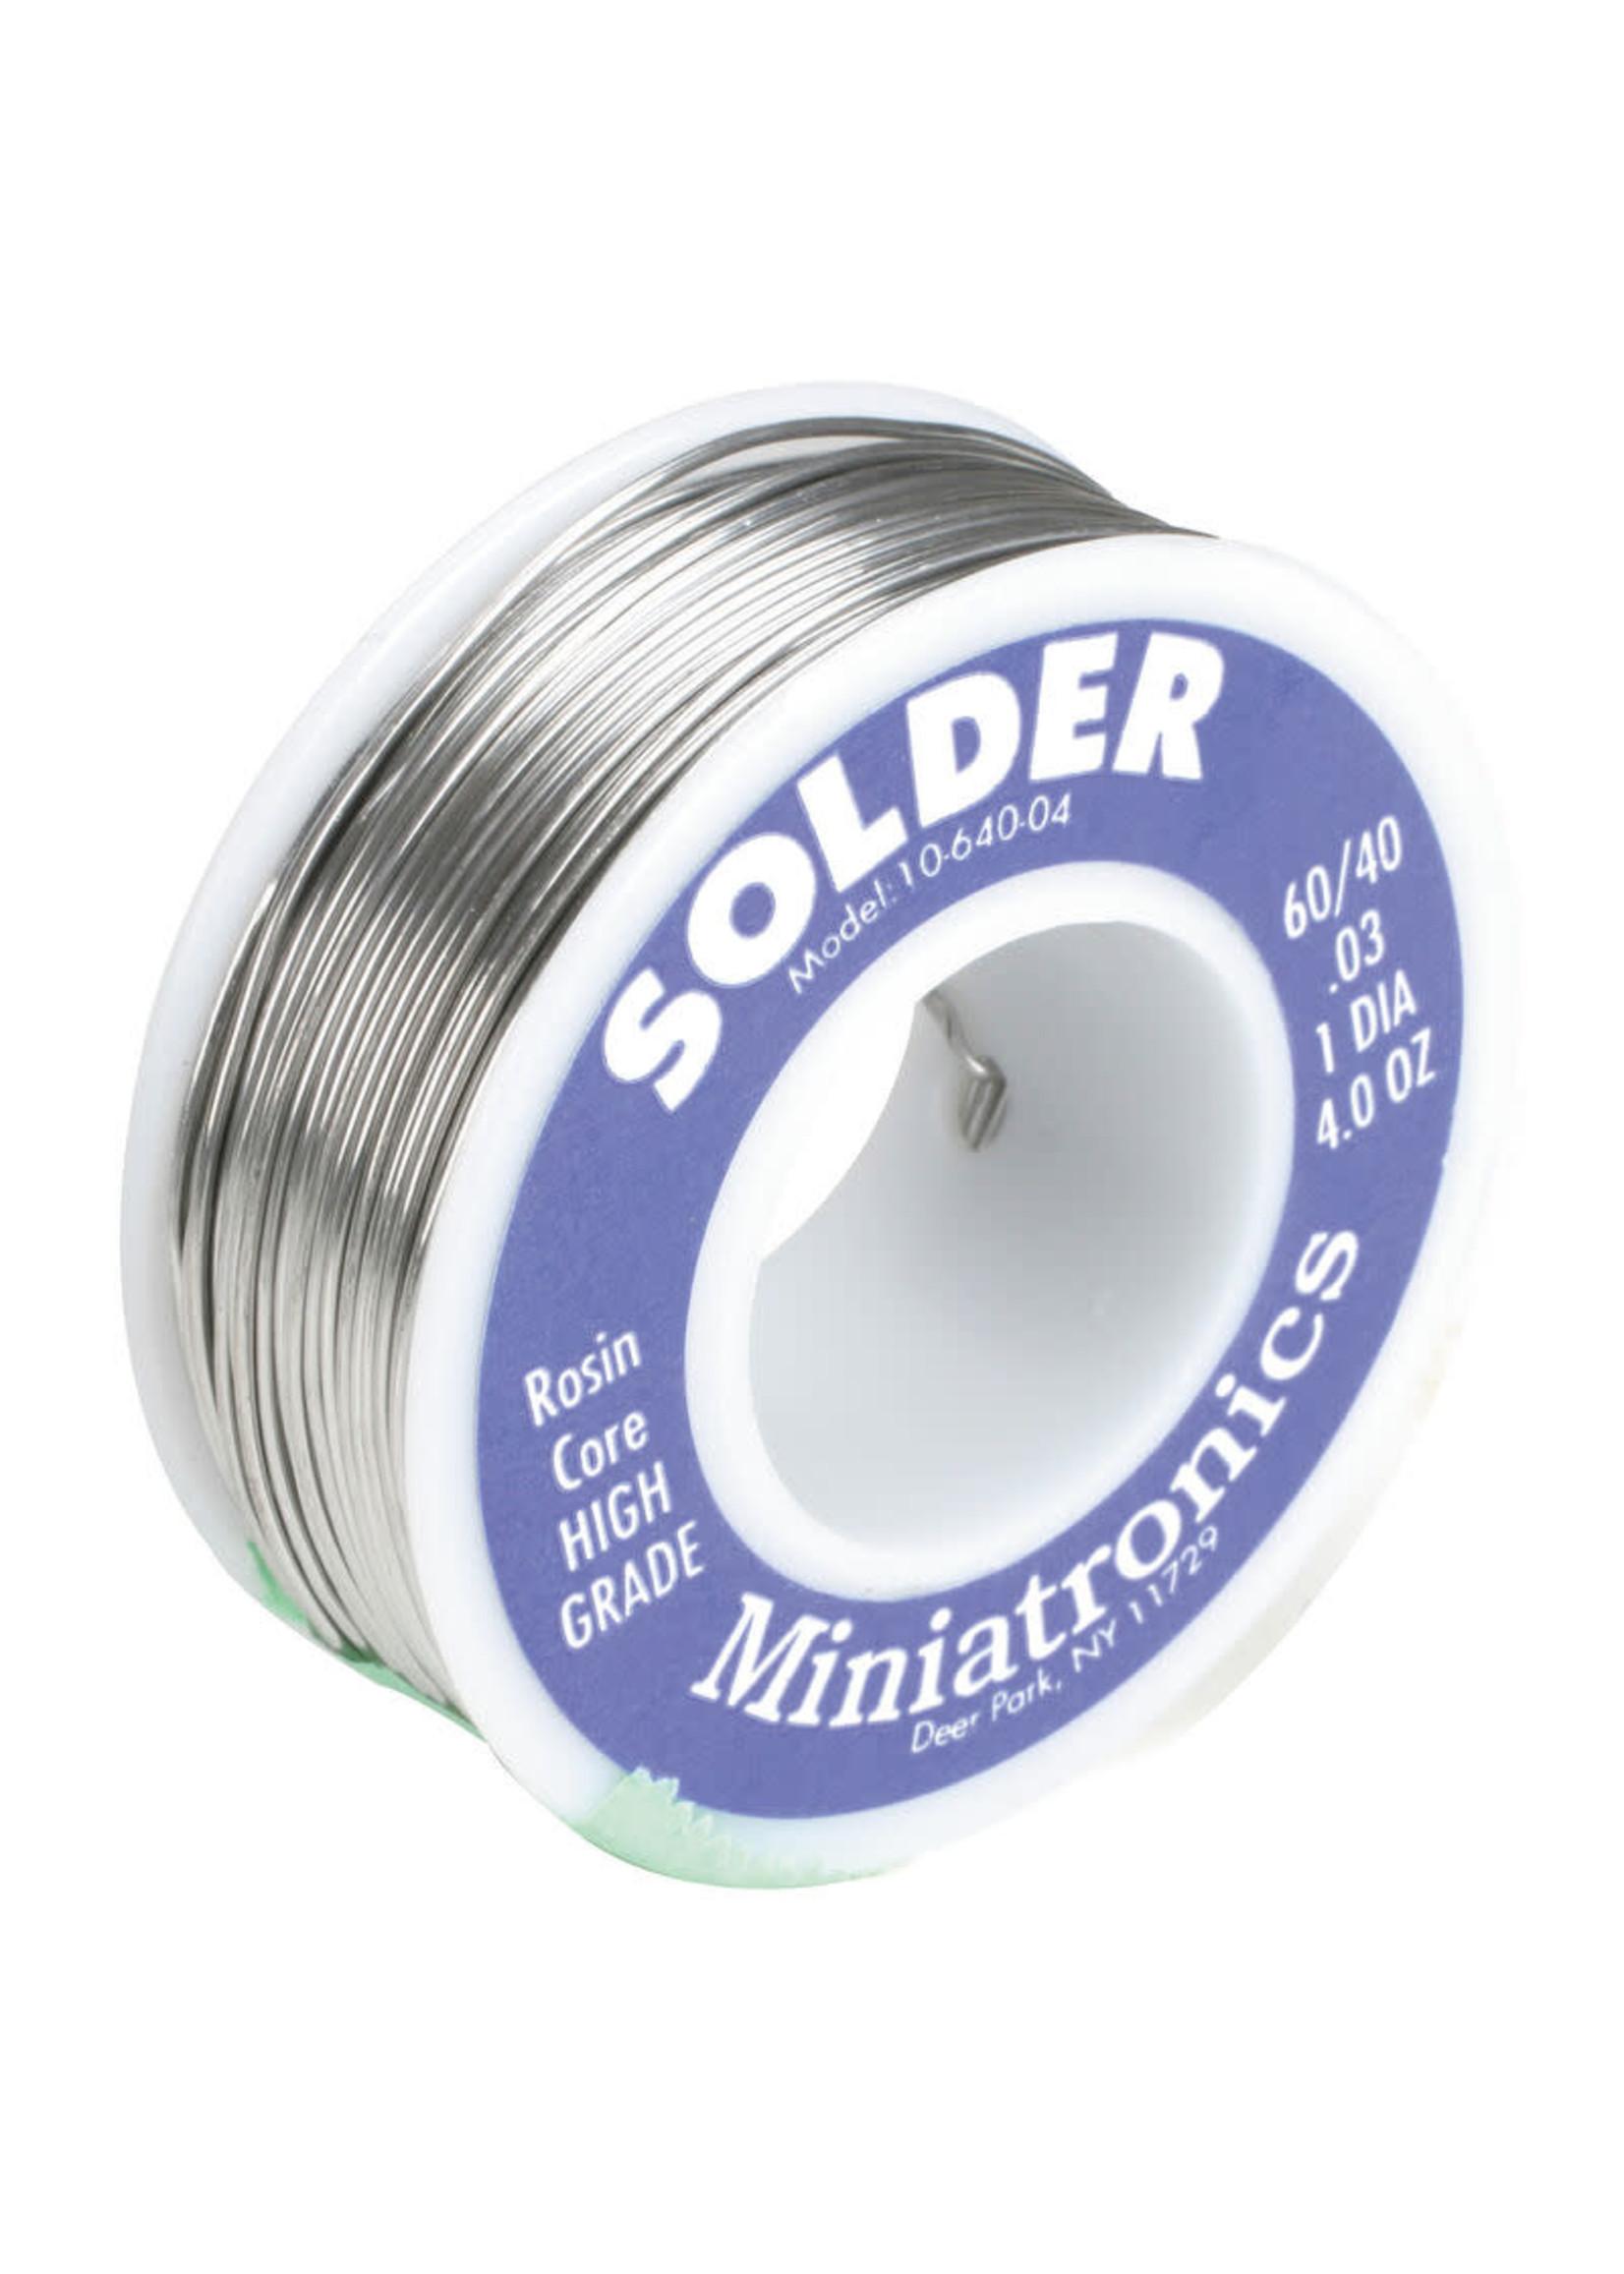 Miniatronics MNT1064004 Miniatronics Rosin Core Solder 60/40, 4oz